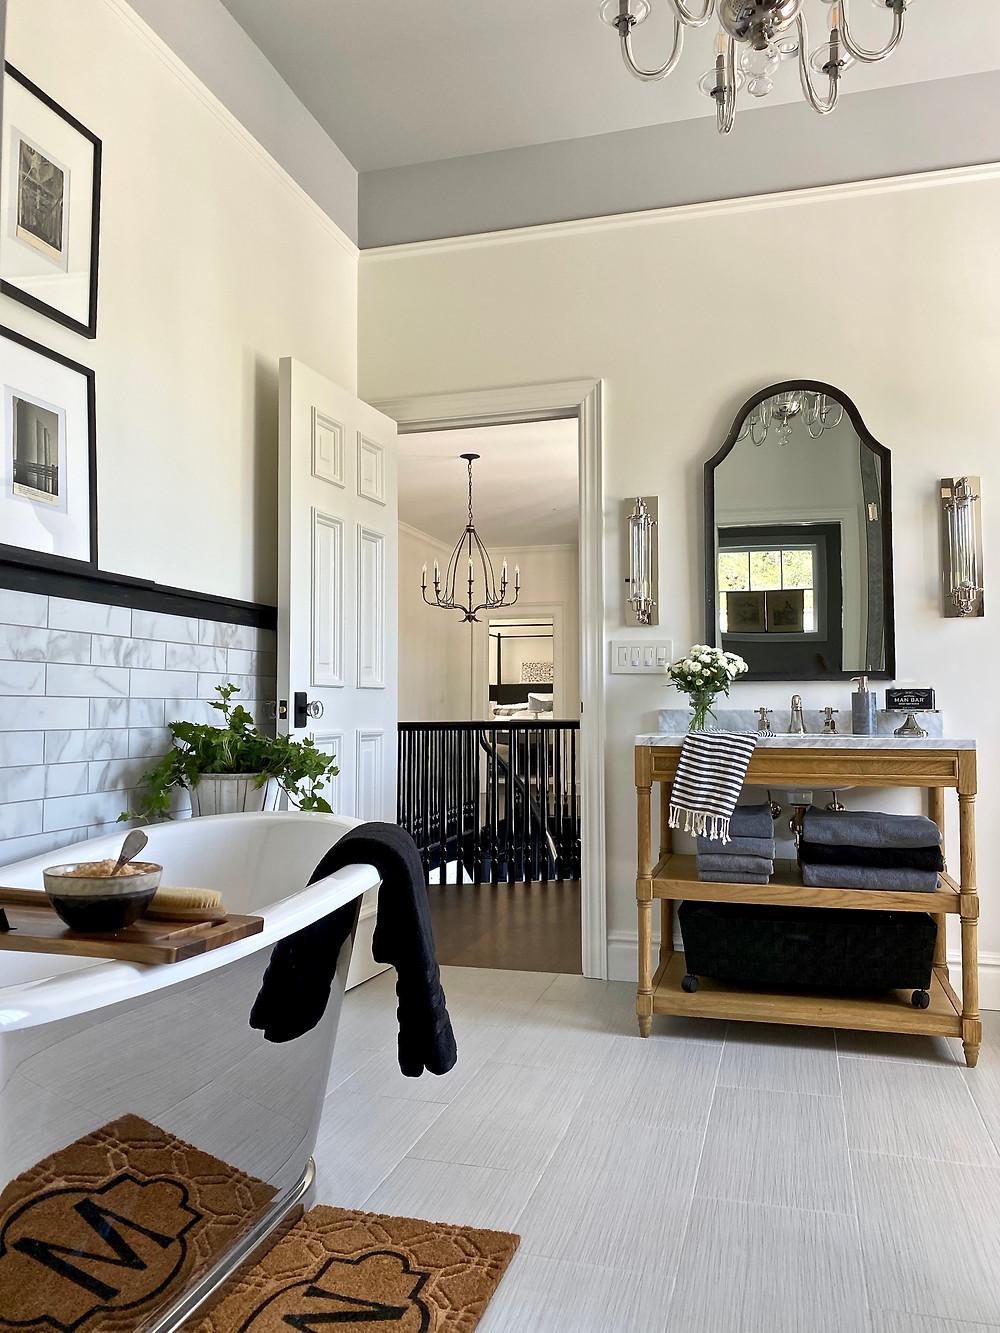 beautiful bathrooms, interior design, bathroom design, vintage bathroom style, gray walls, white dove, vintage art, art wall, black chandelier